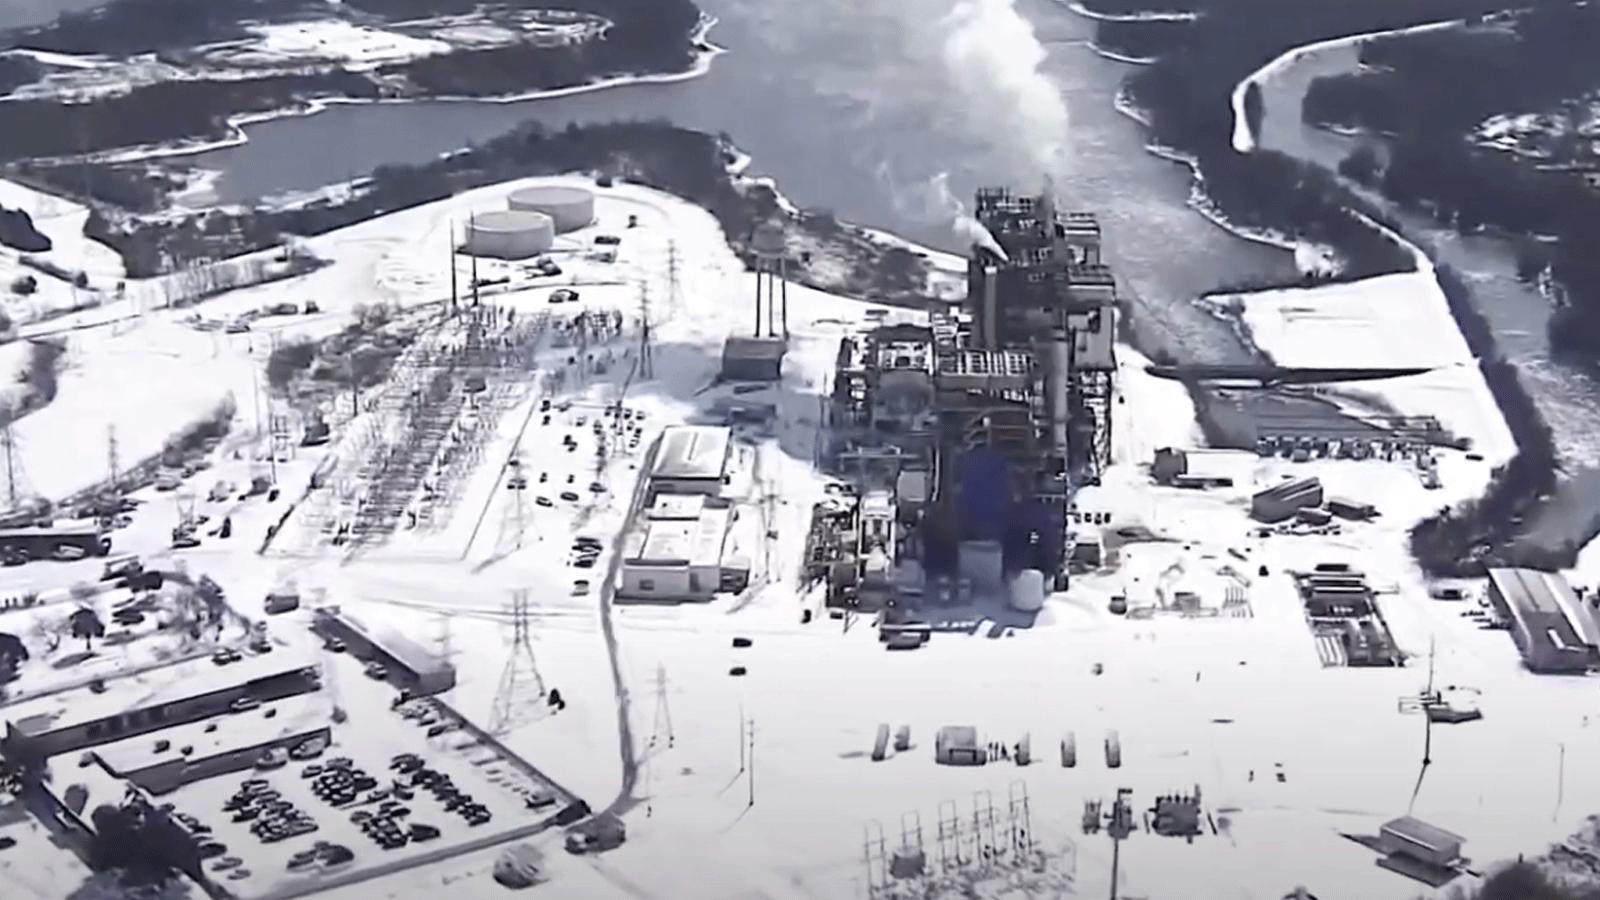 Texas power plant